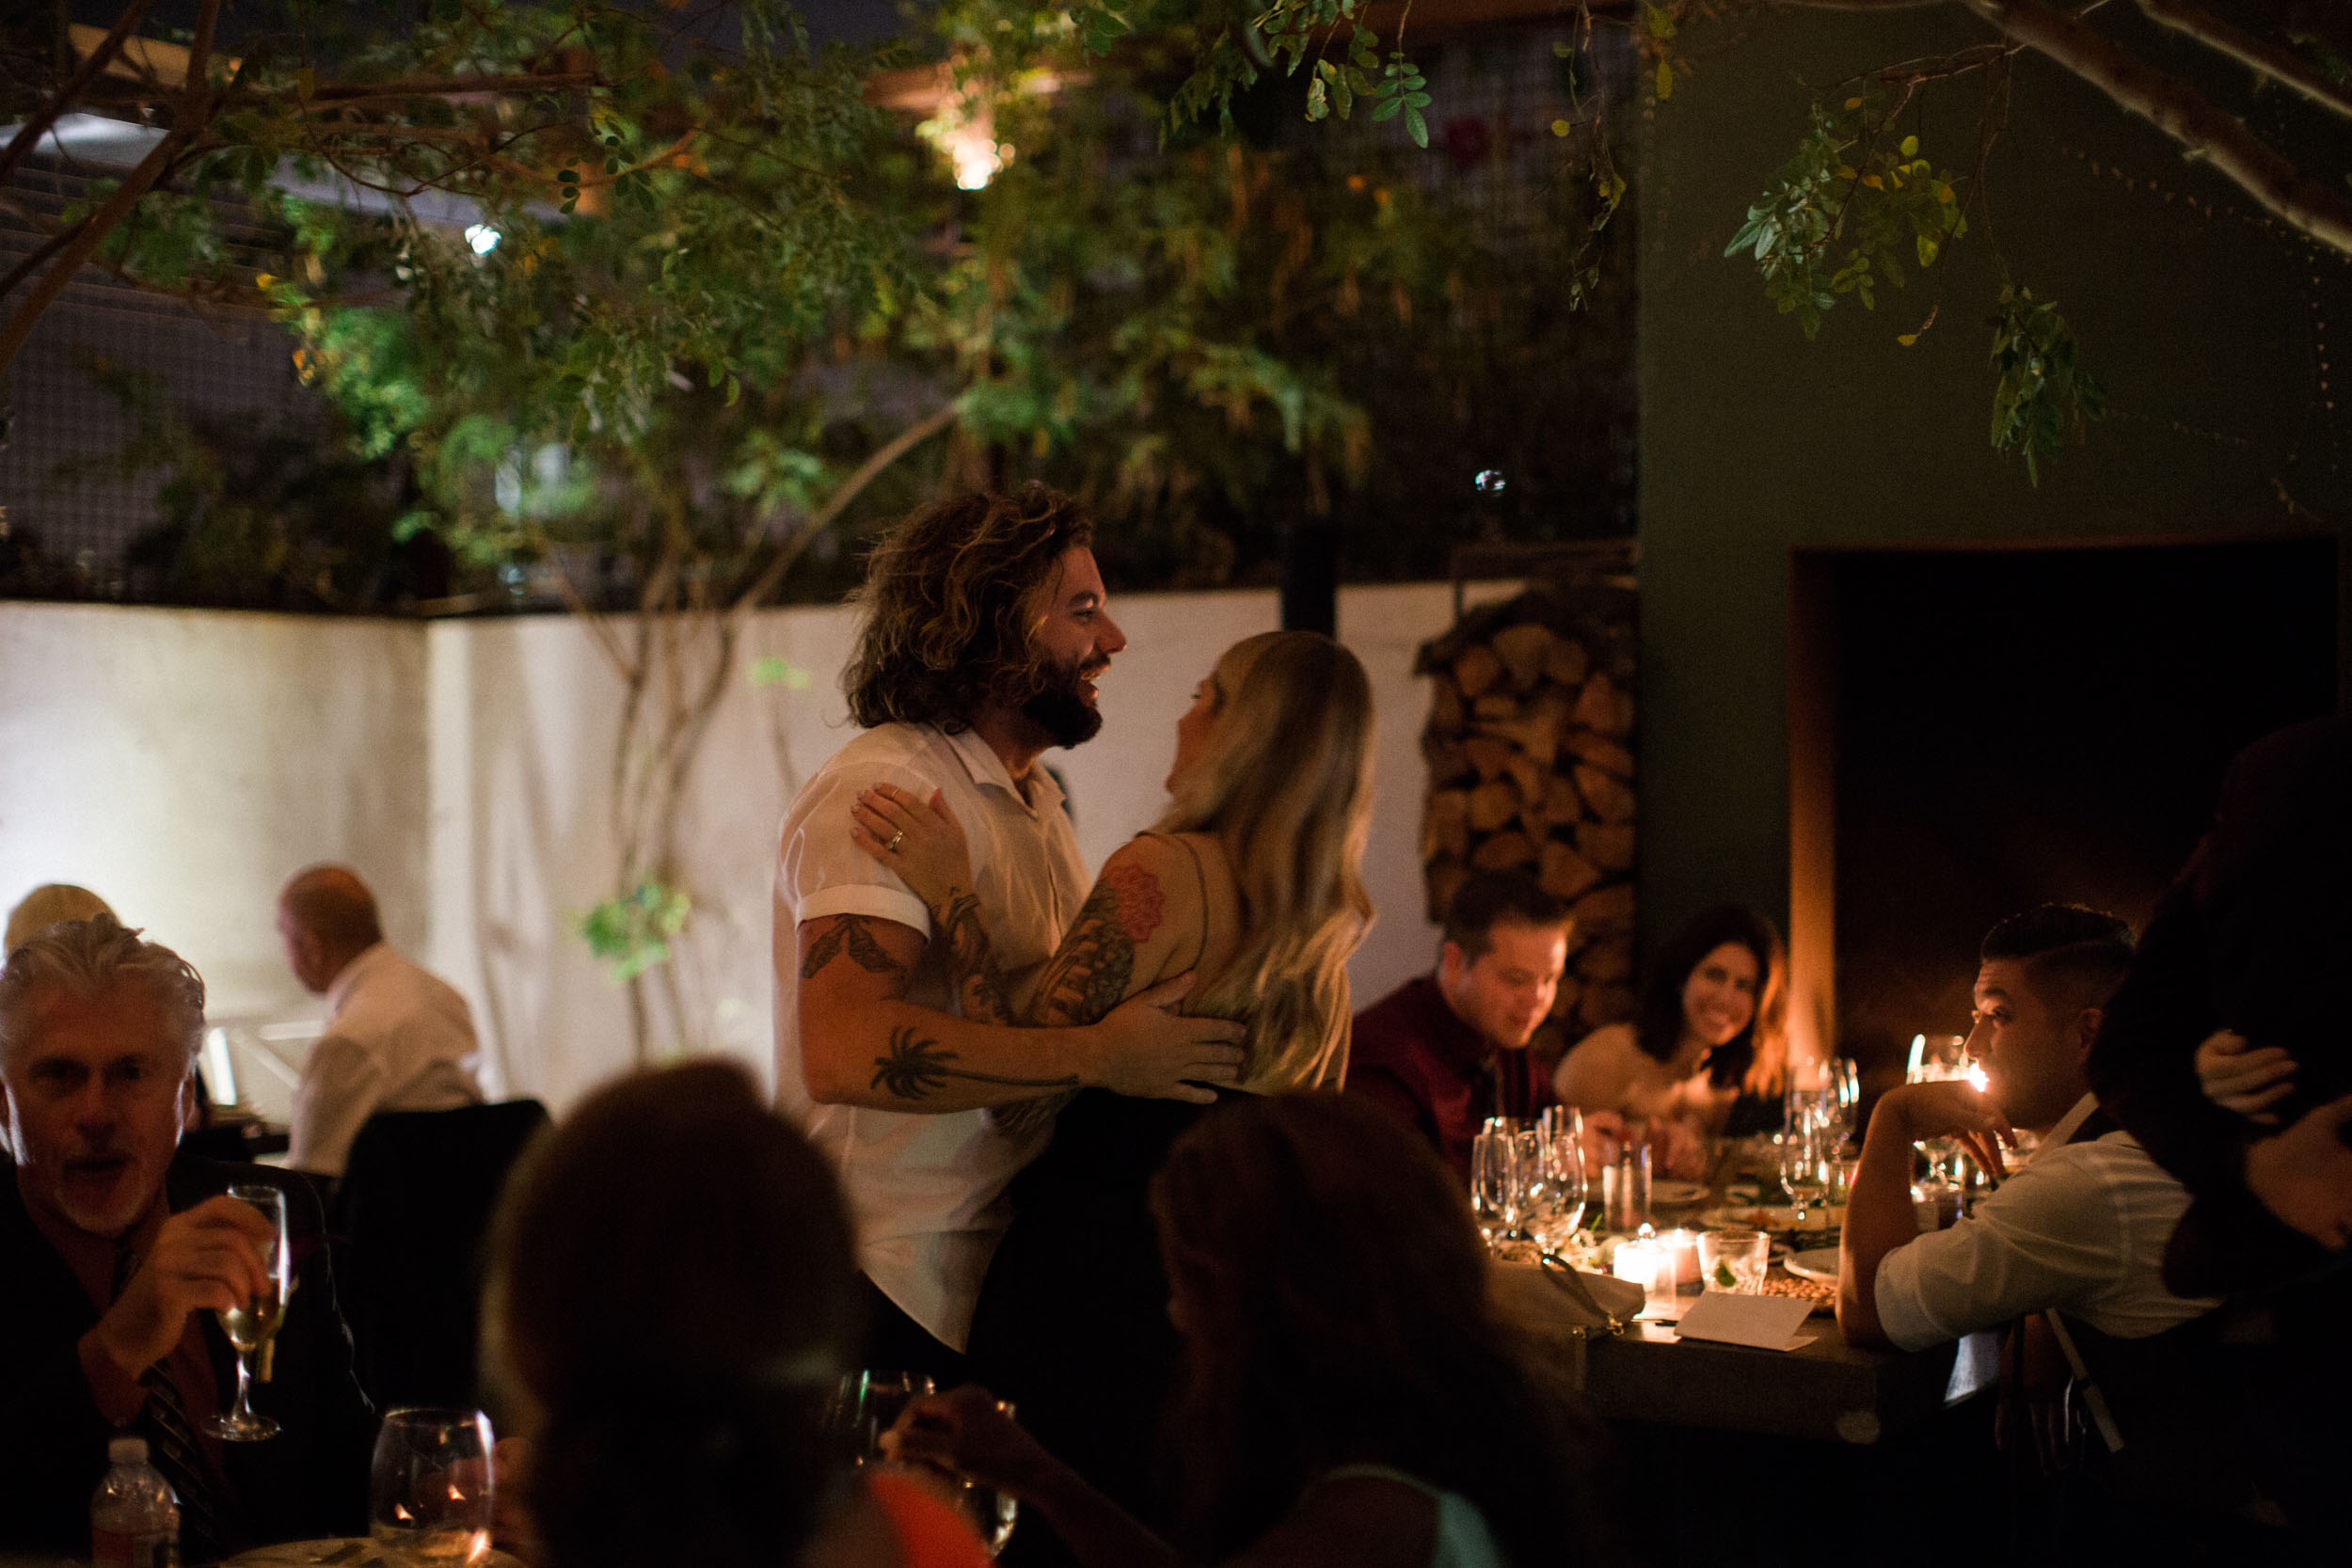 BKM-Photography-Highland-Park-Los-Angeles-Backyard-Wedding-0075.jpg